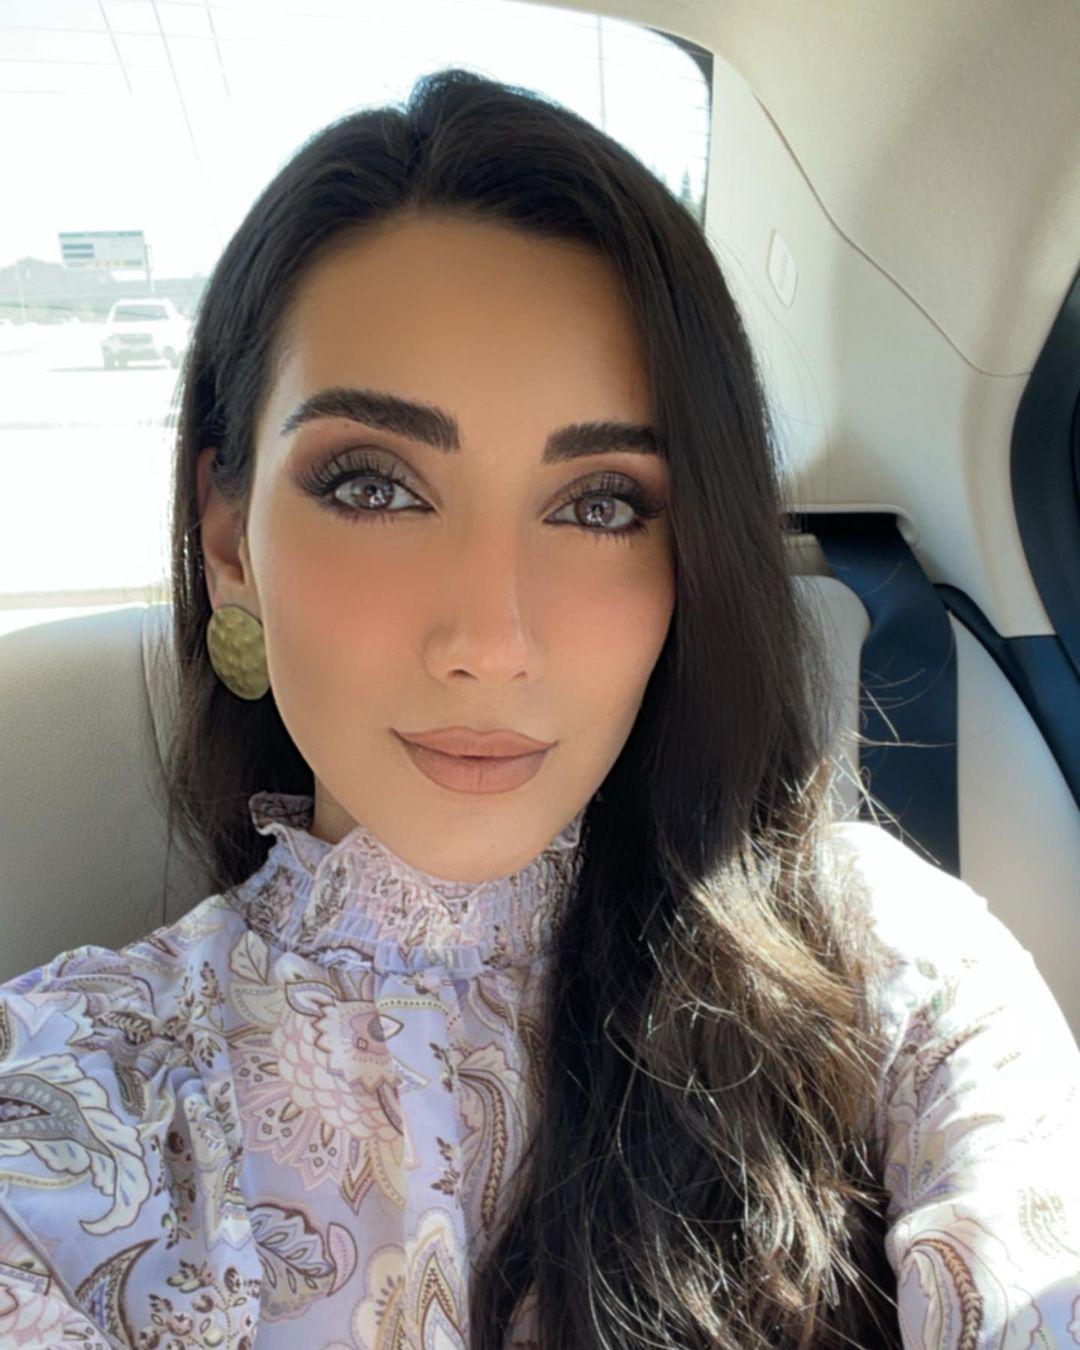 Sadaf-Beauty-Wallpapers-Insta-Fit-Bio-Sadaf-Taherian-Wallpapers-Insta-Fit-Bio-7